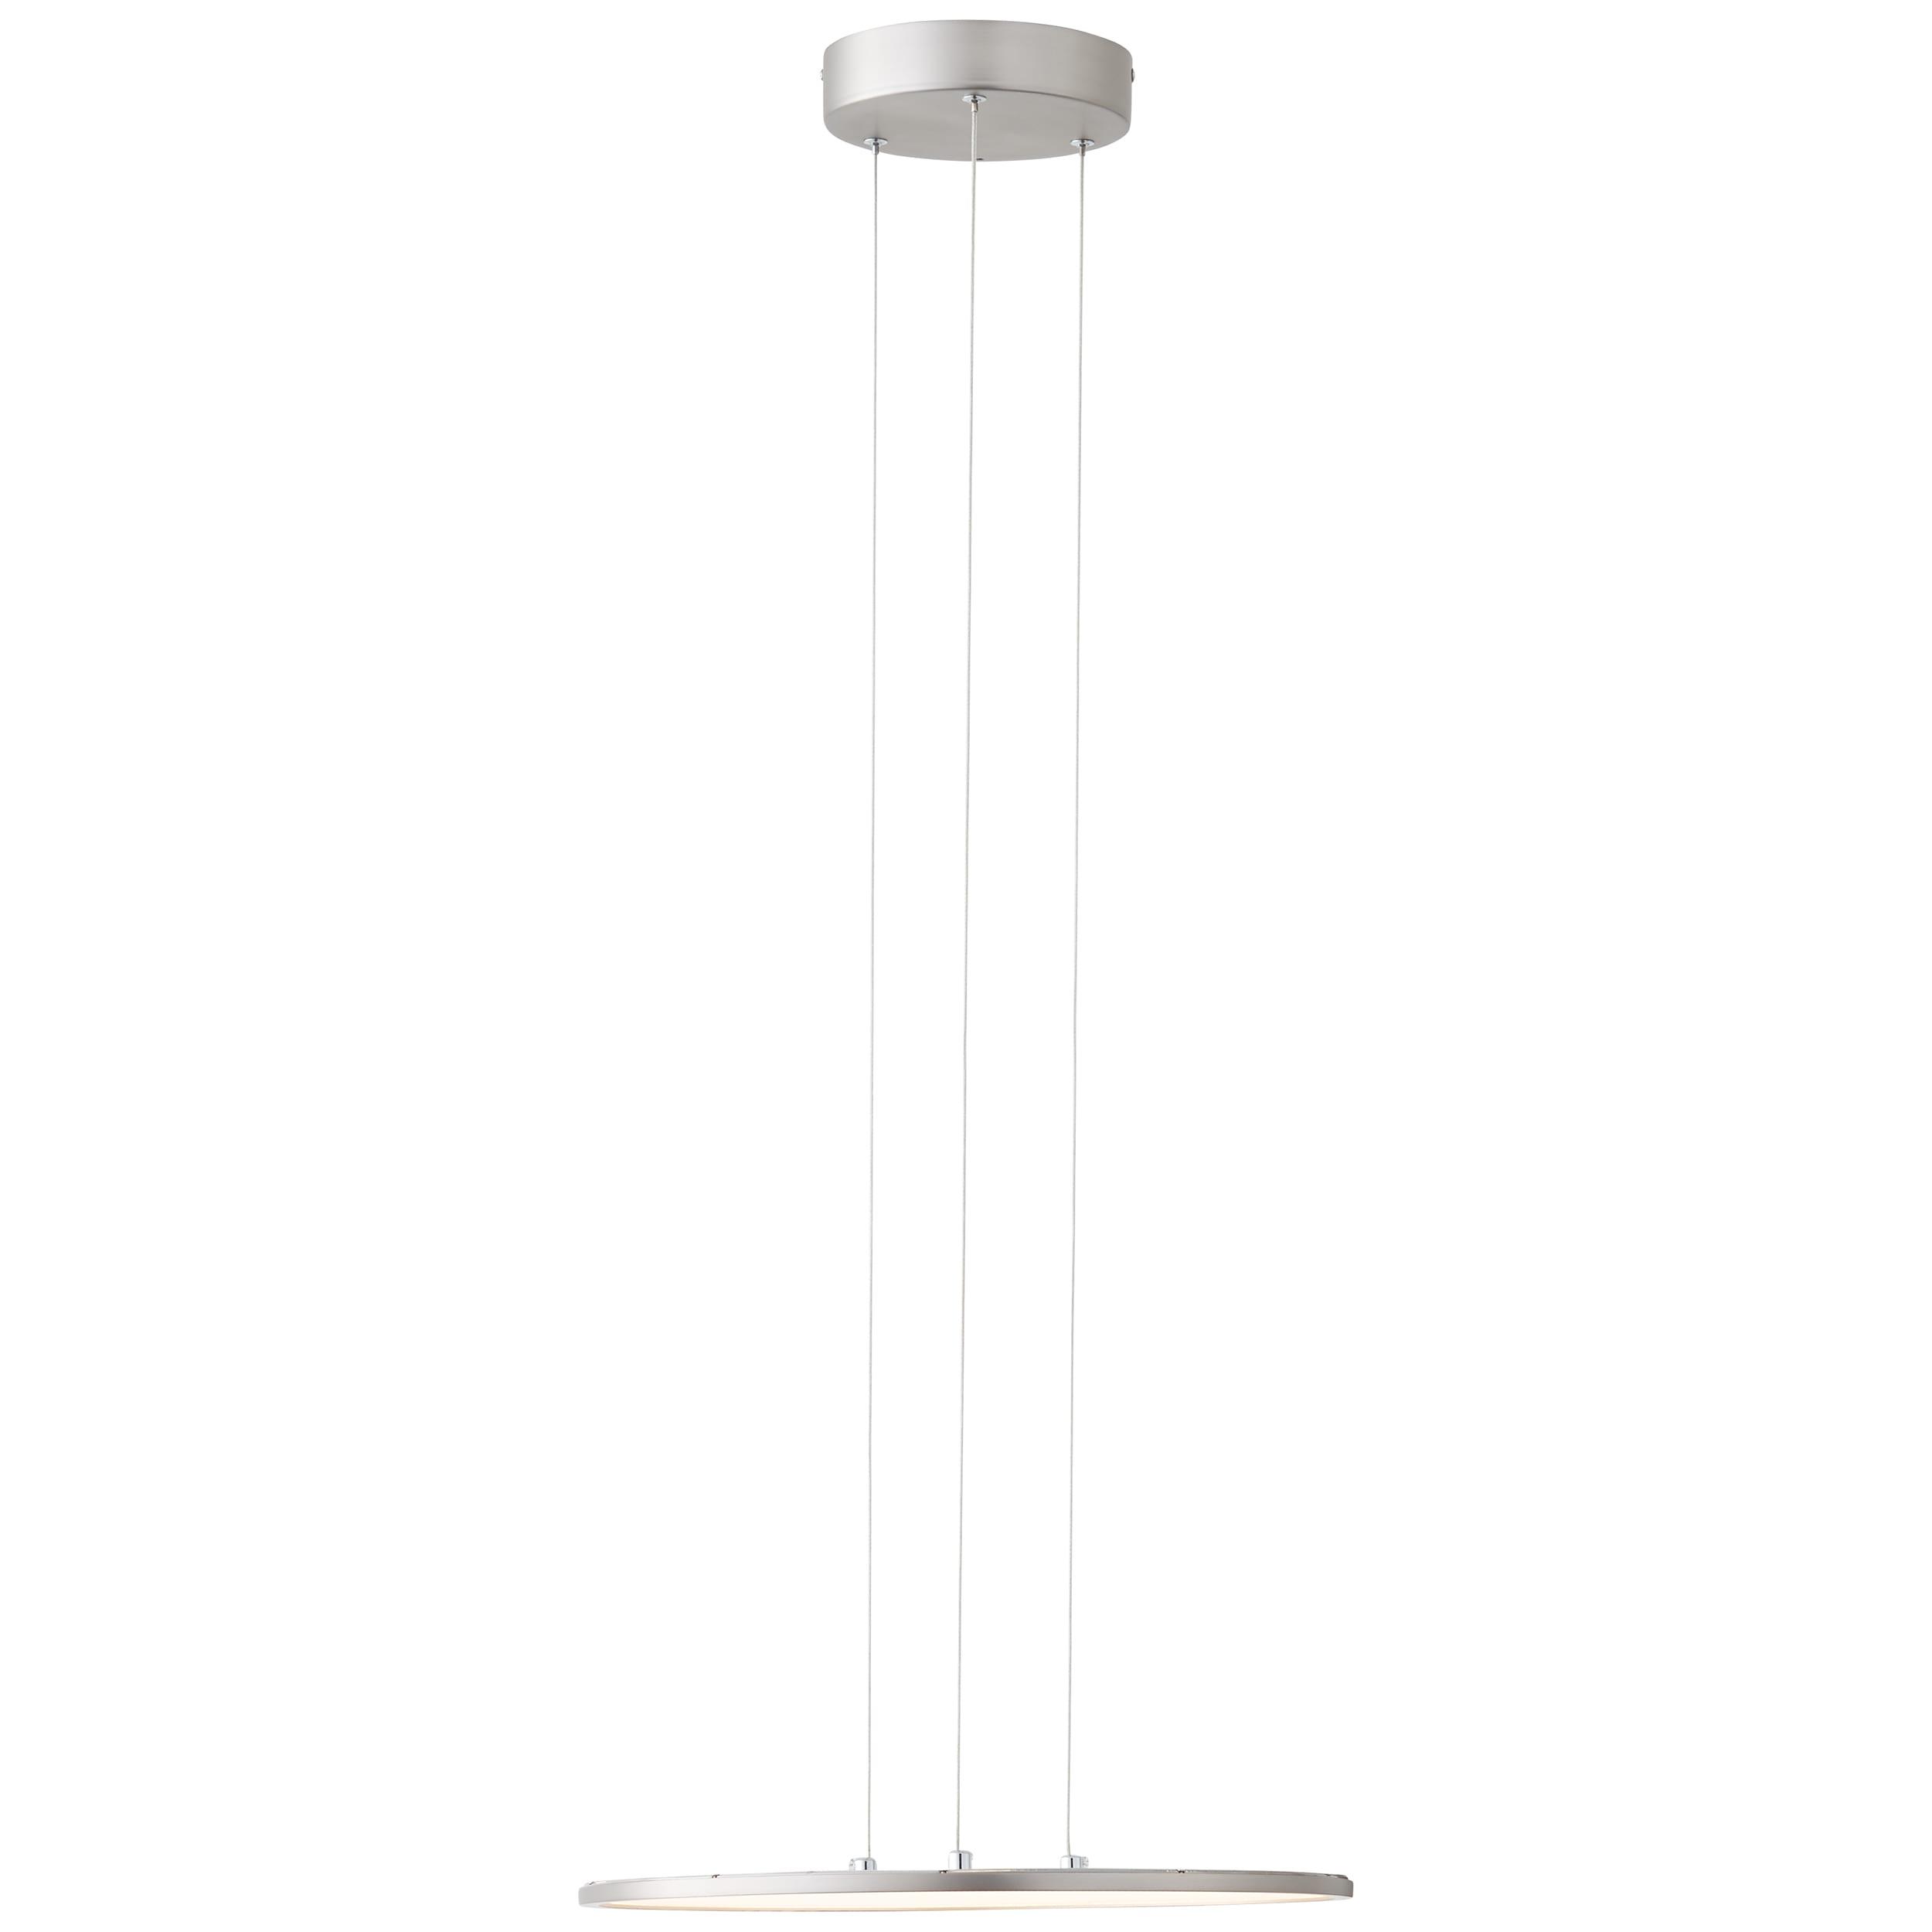 AEG Devin WiZ LED Pendelleuchte Paneel 45cm nickel